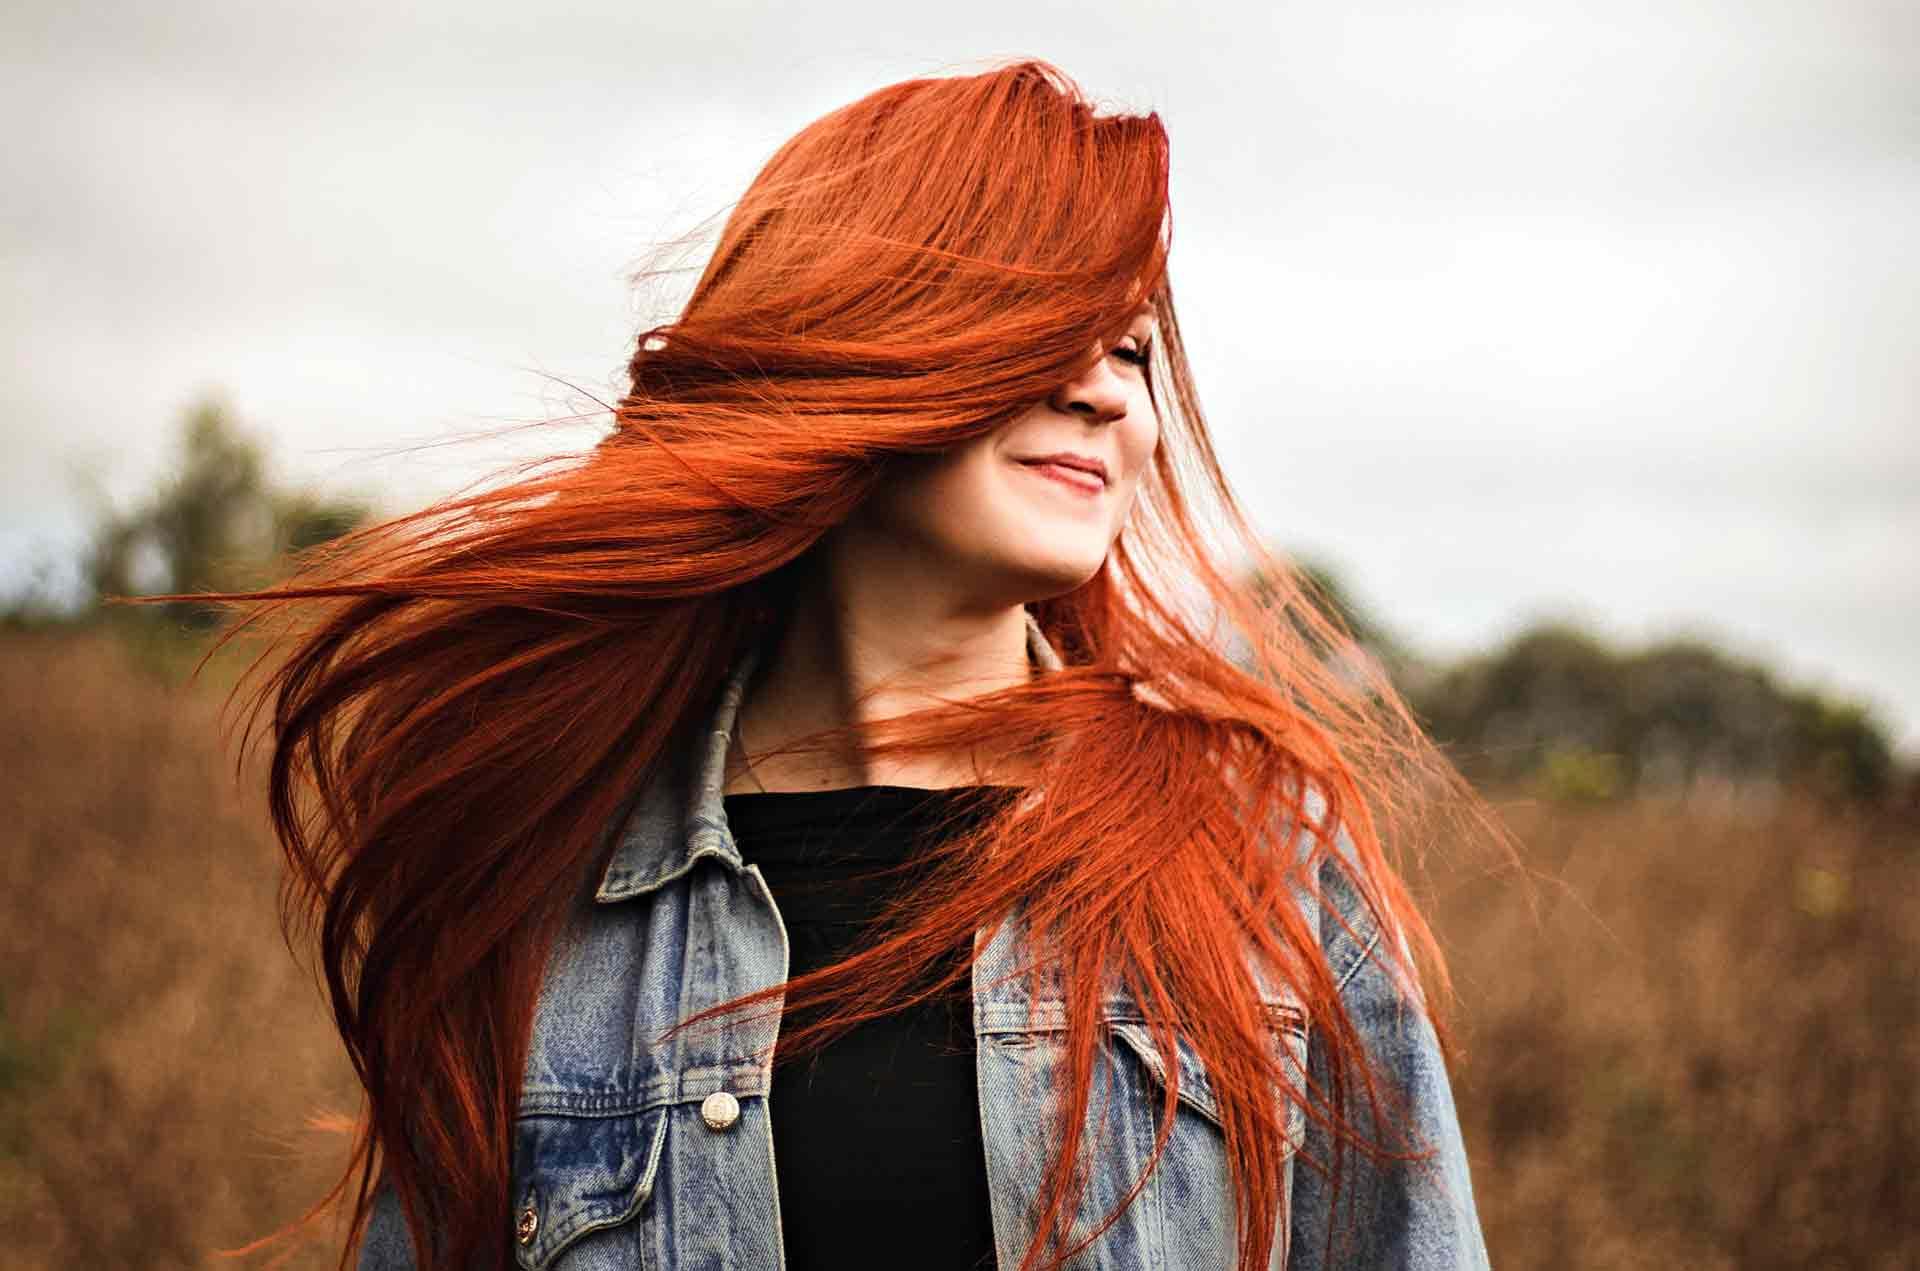 Jente rødt hår